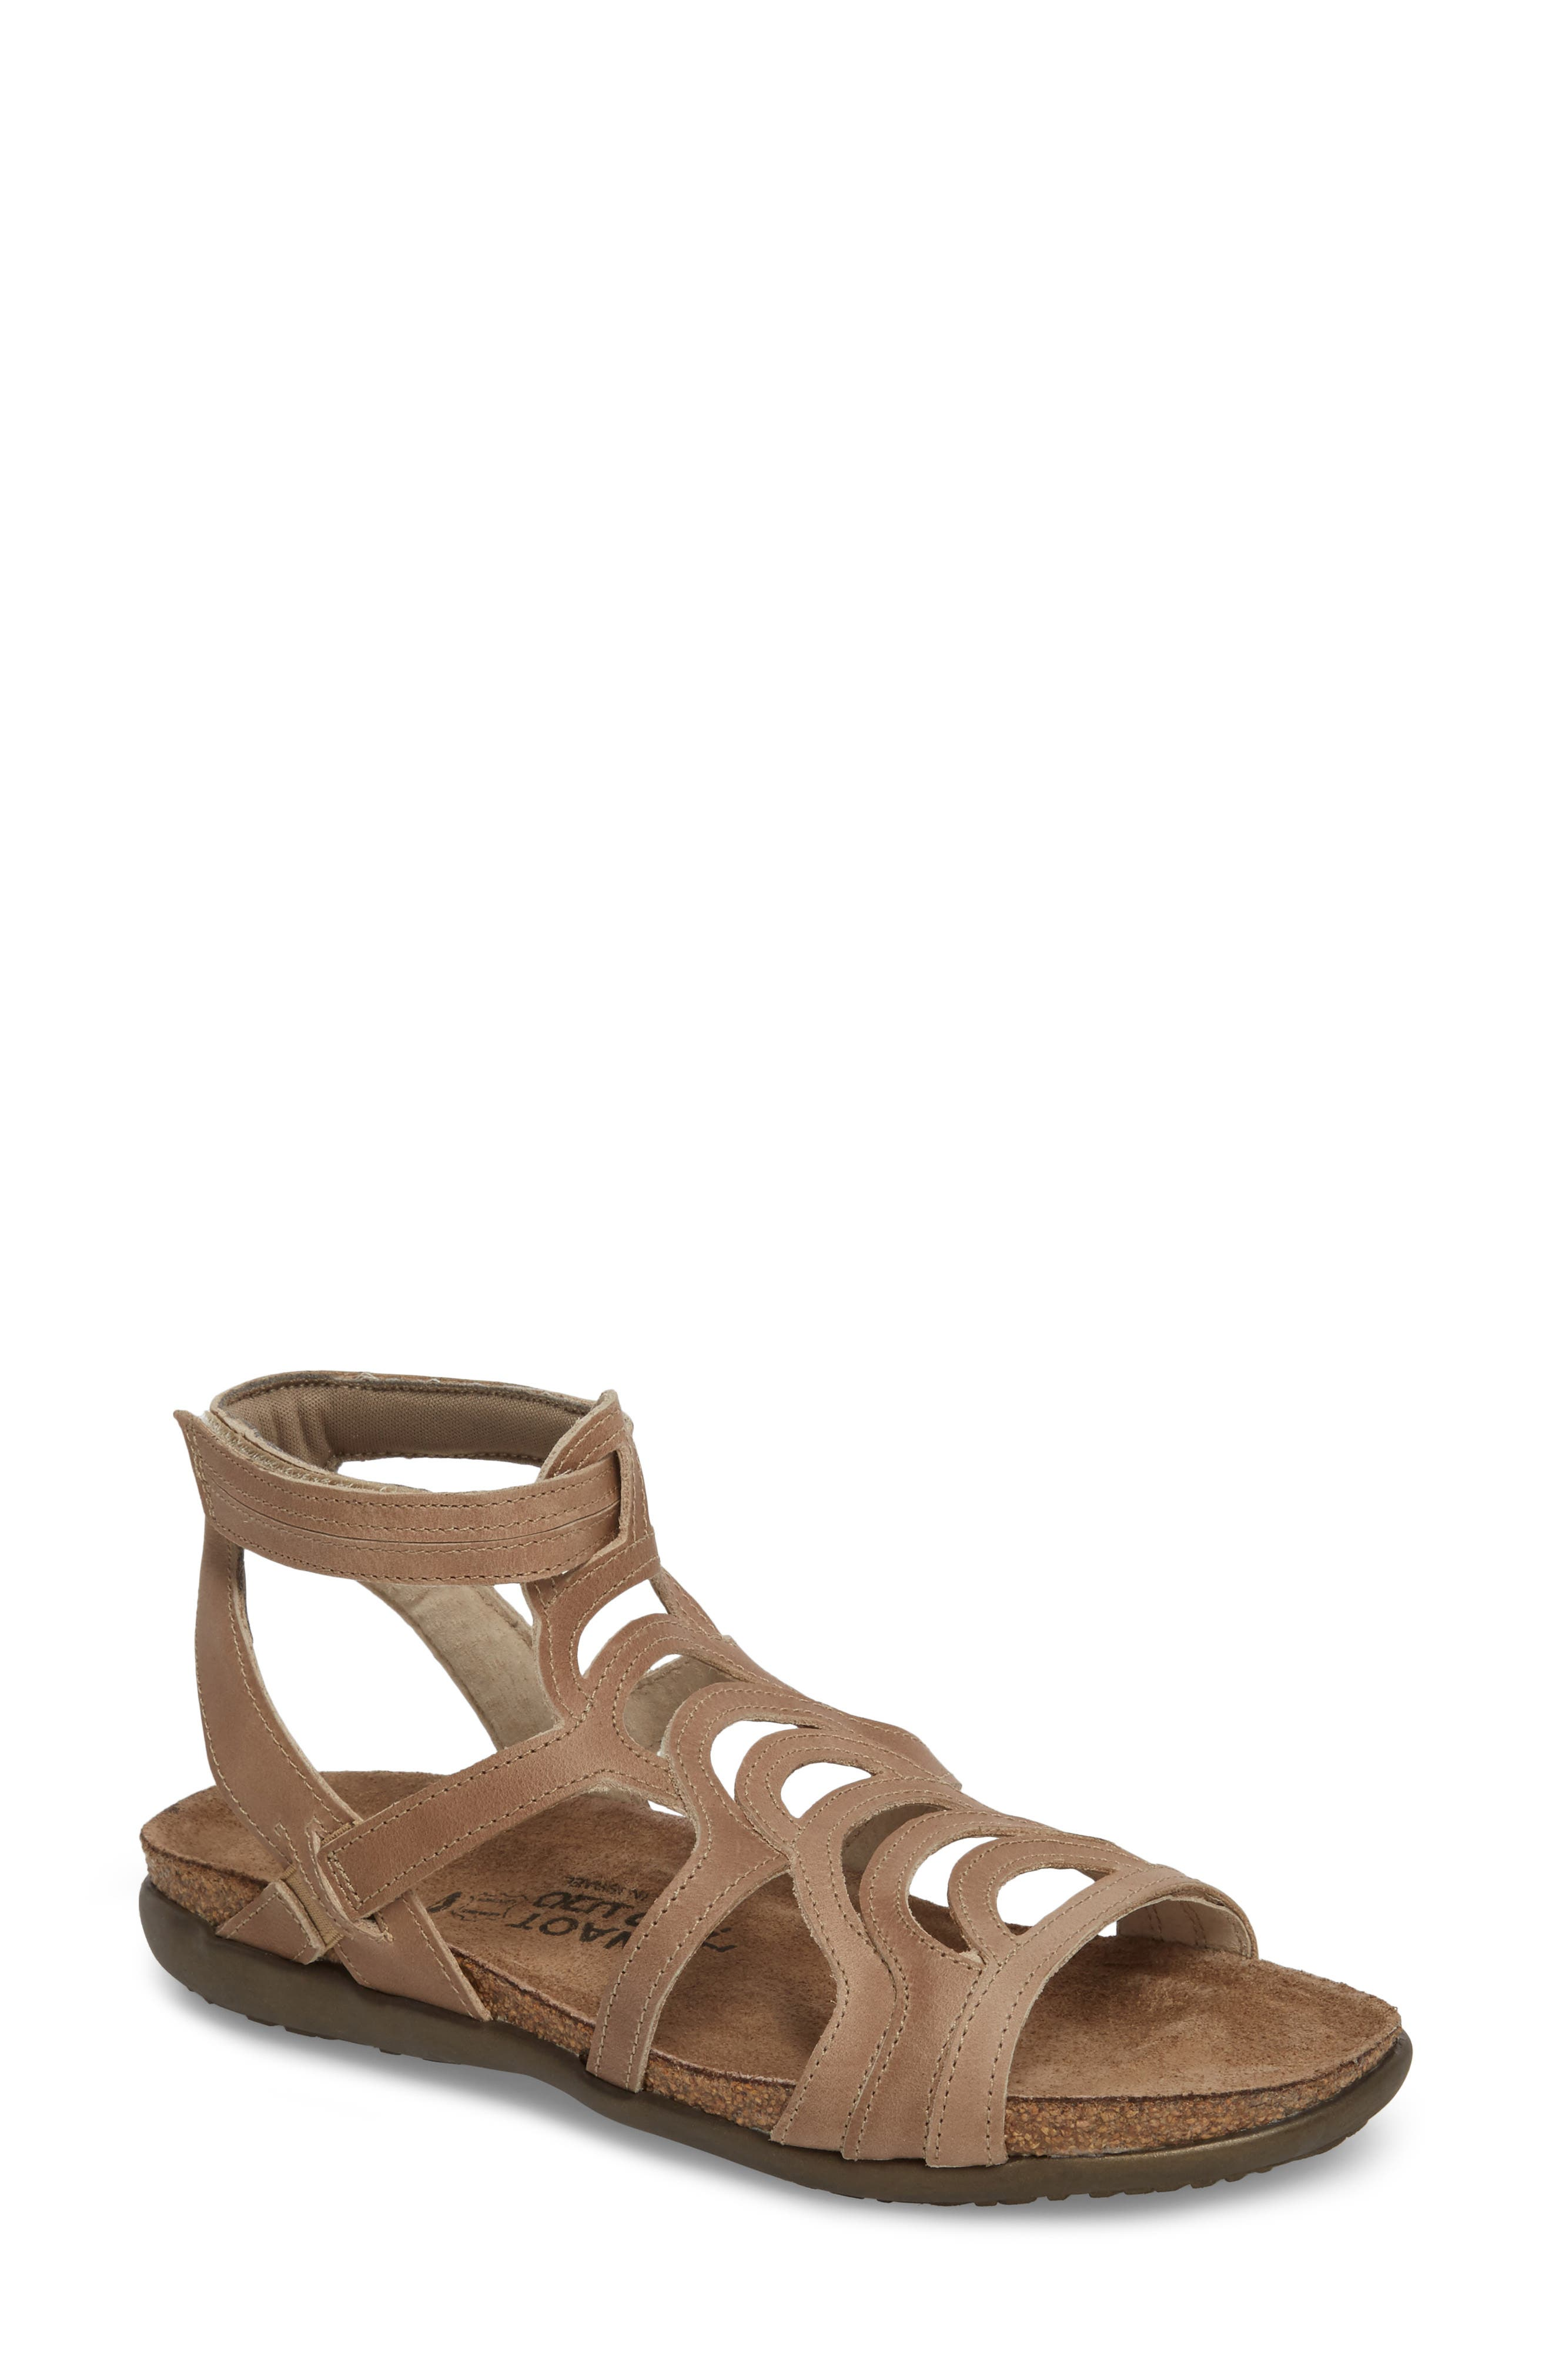 NAOT 'Sara' Gladiator Sandal, Main, color, KHAKI BEIGE LEATHER